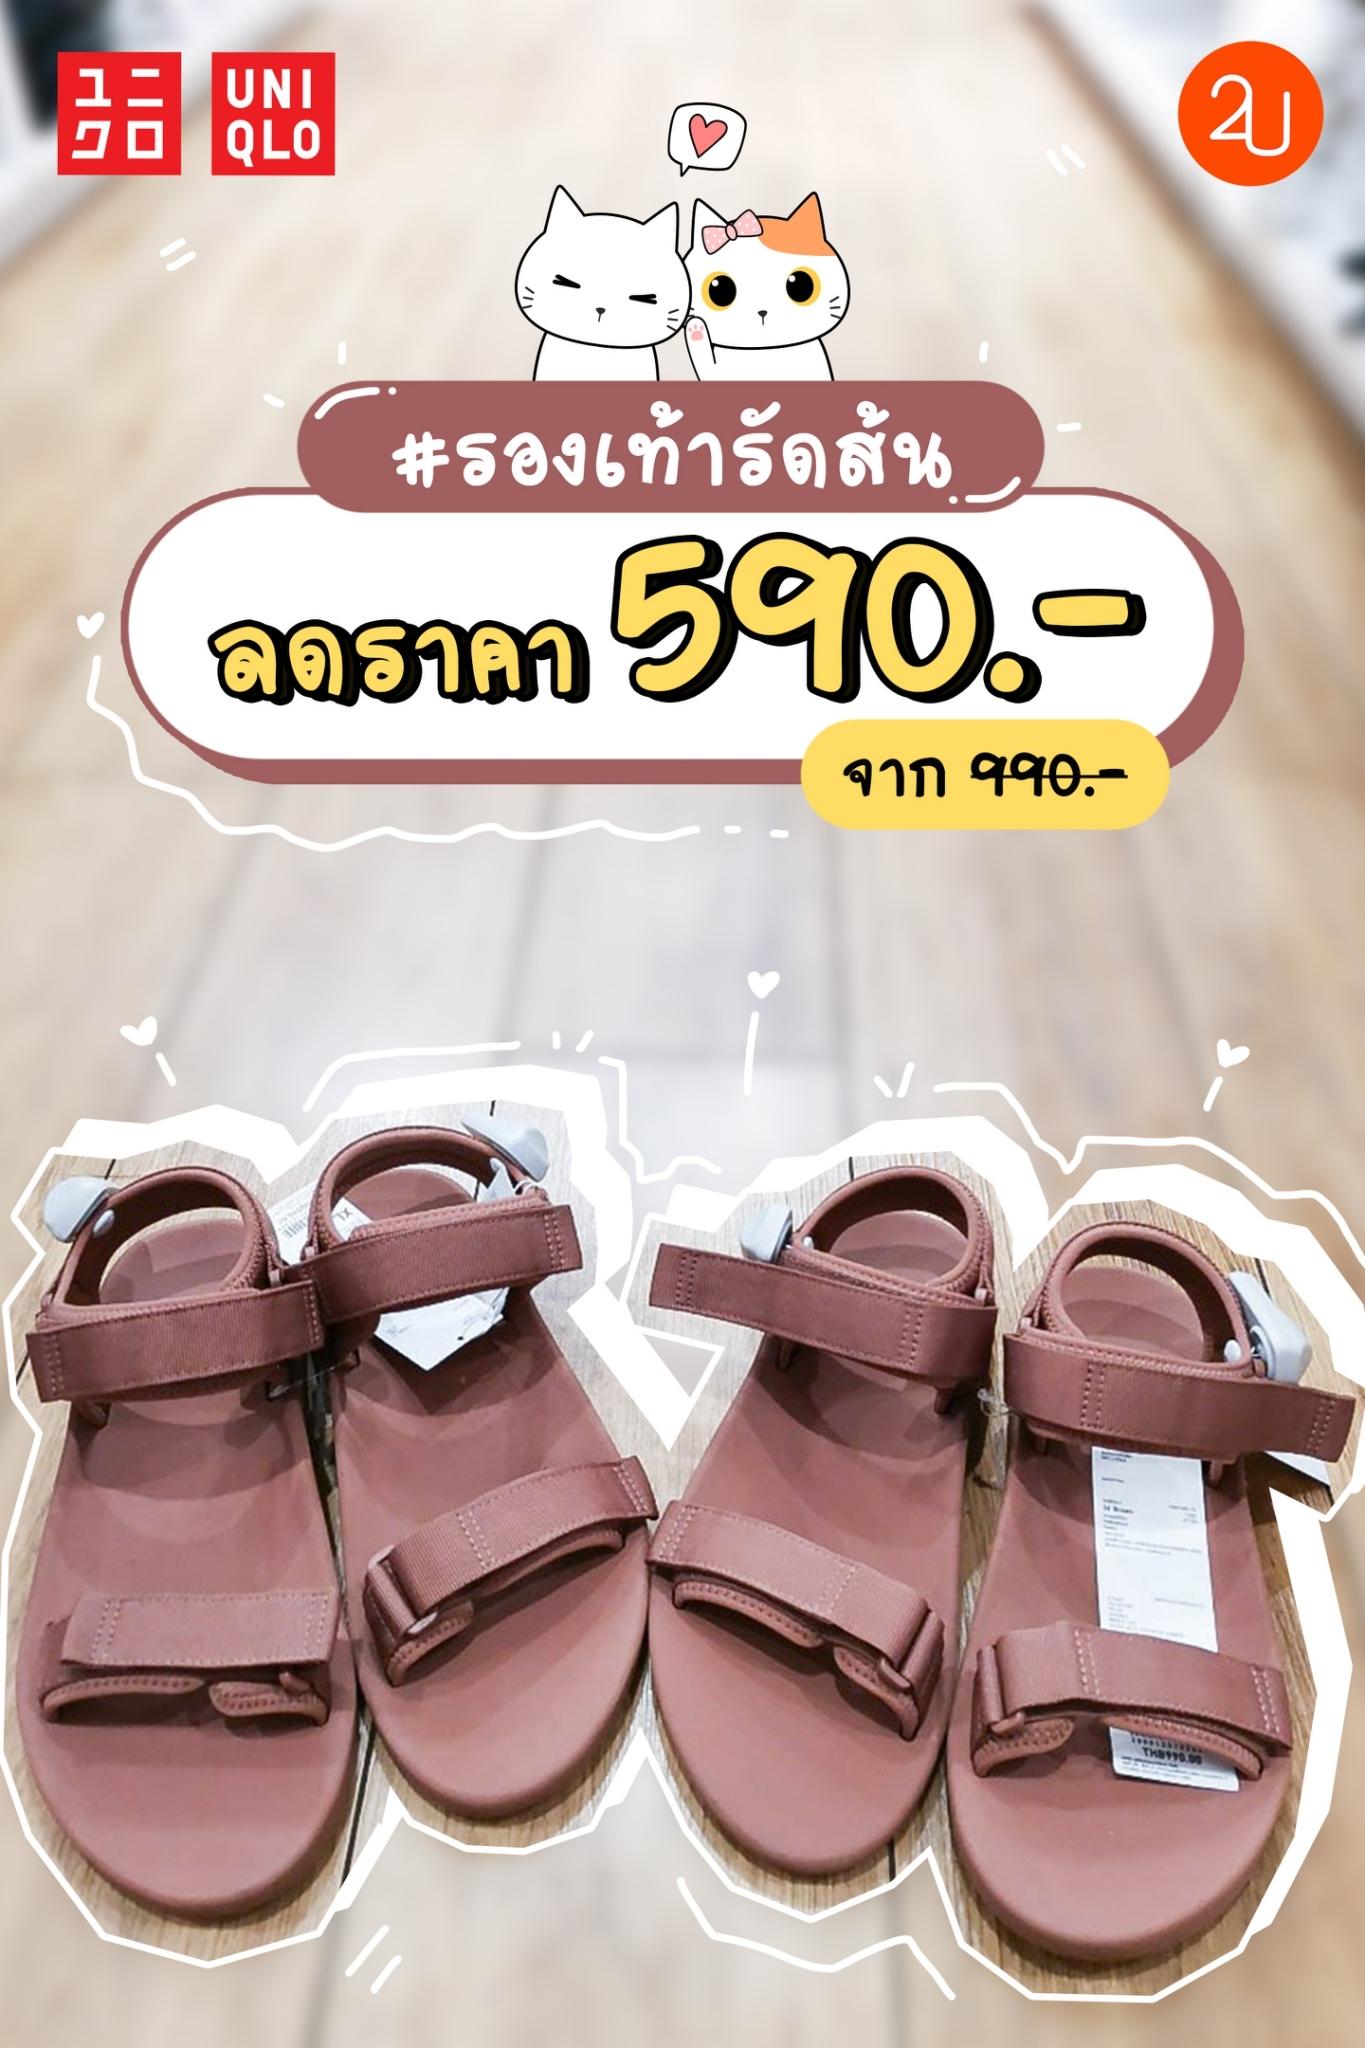 Promotion Uniqlo U Slingback Sale 590 bath